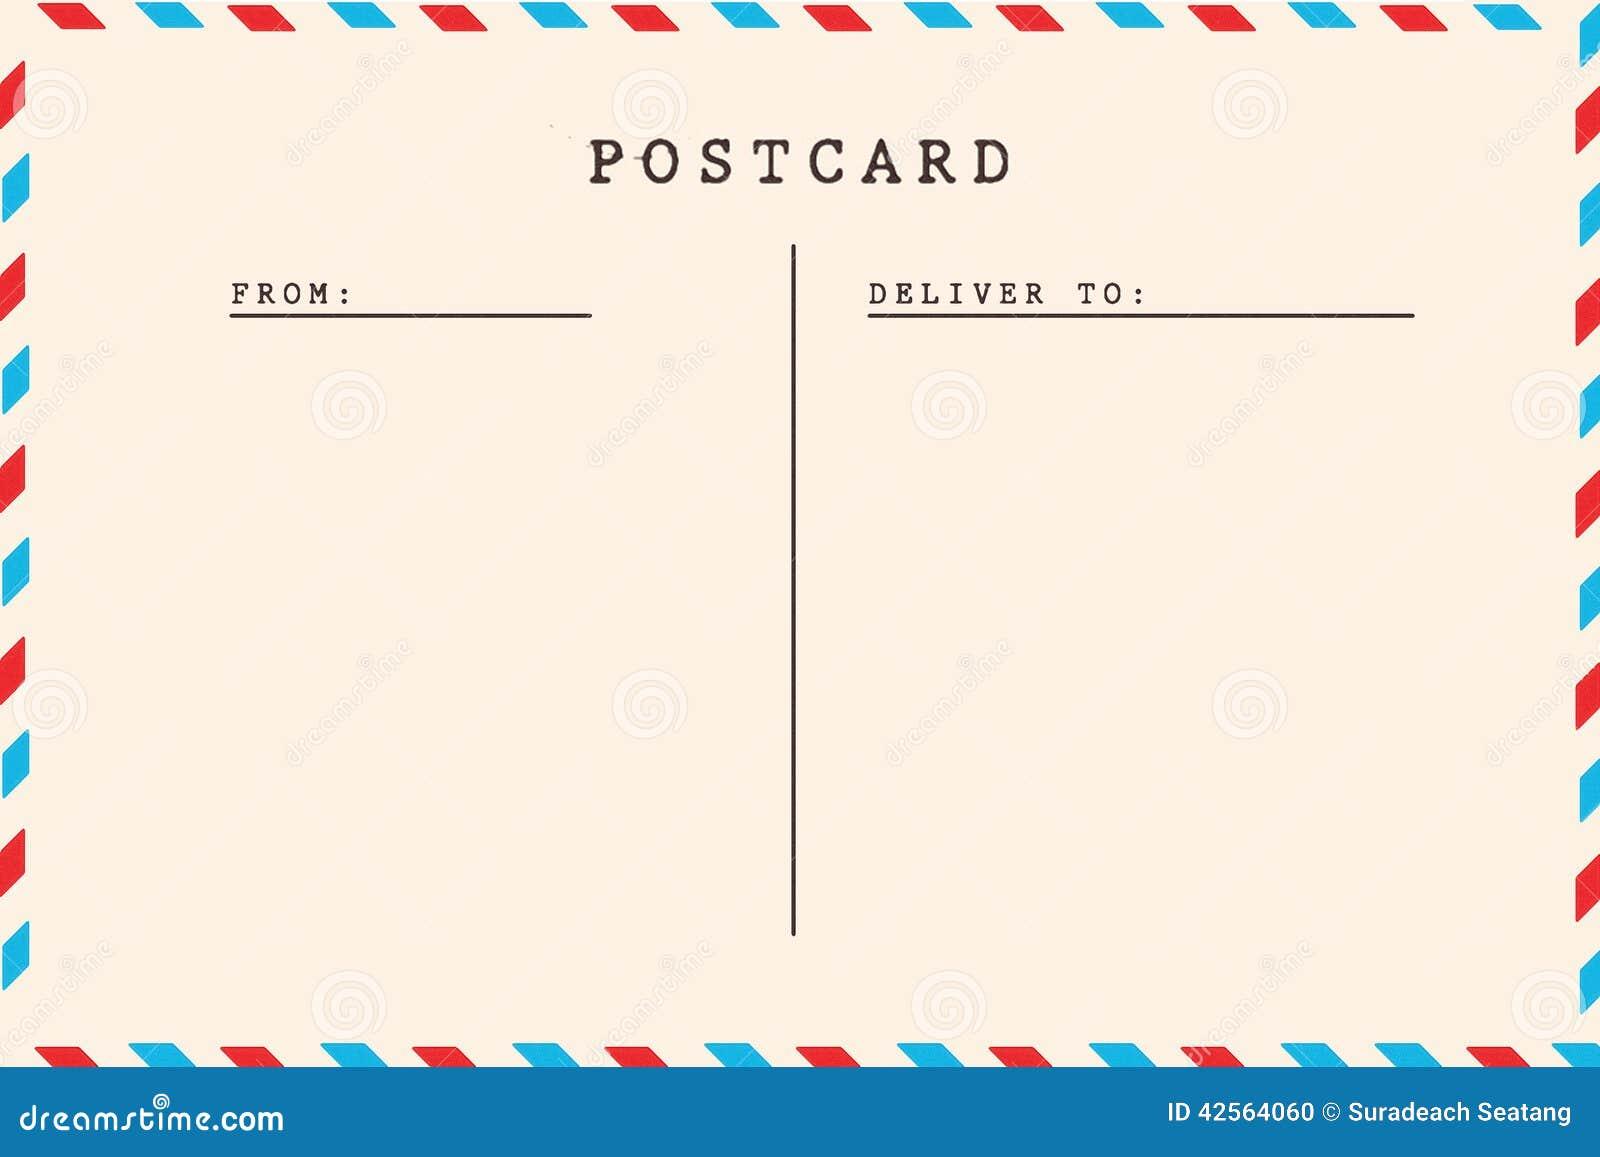 Back Of Vintage Blank Postcard Stock Photo Image Of